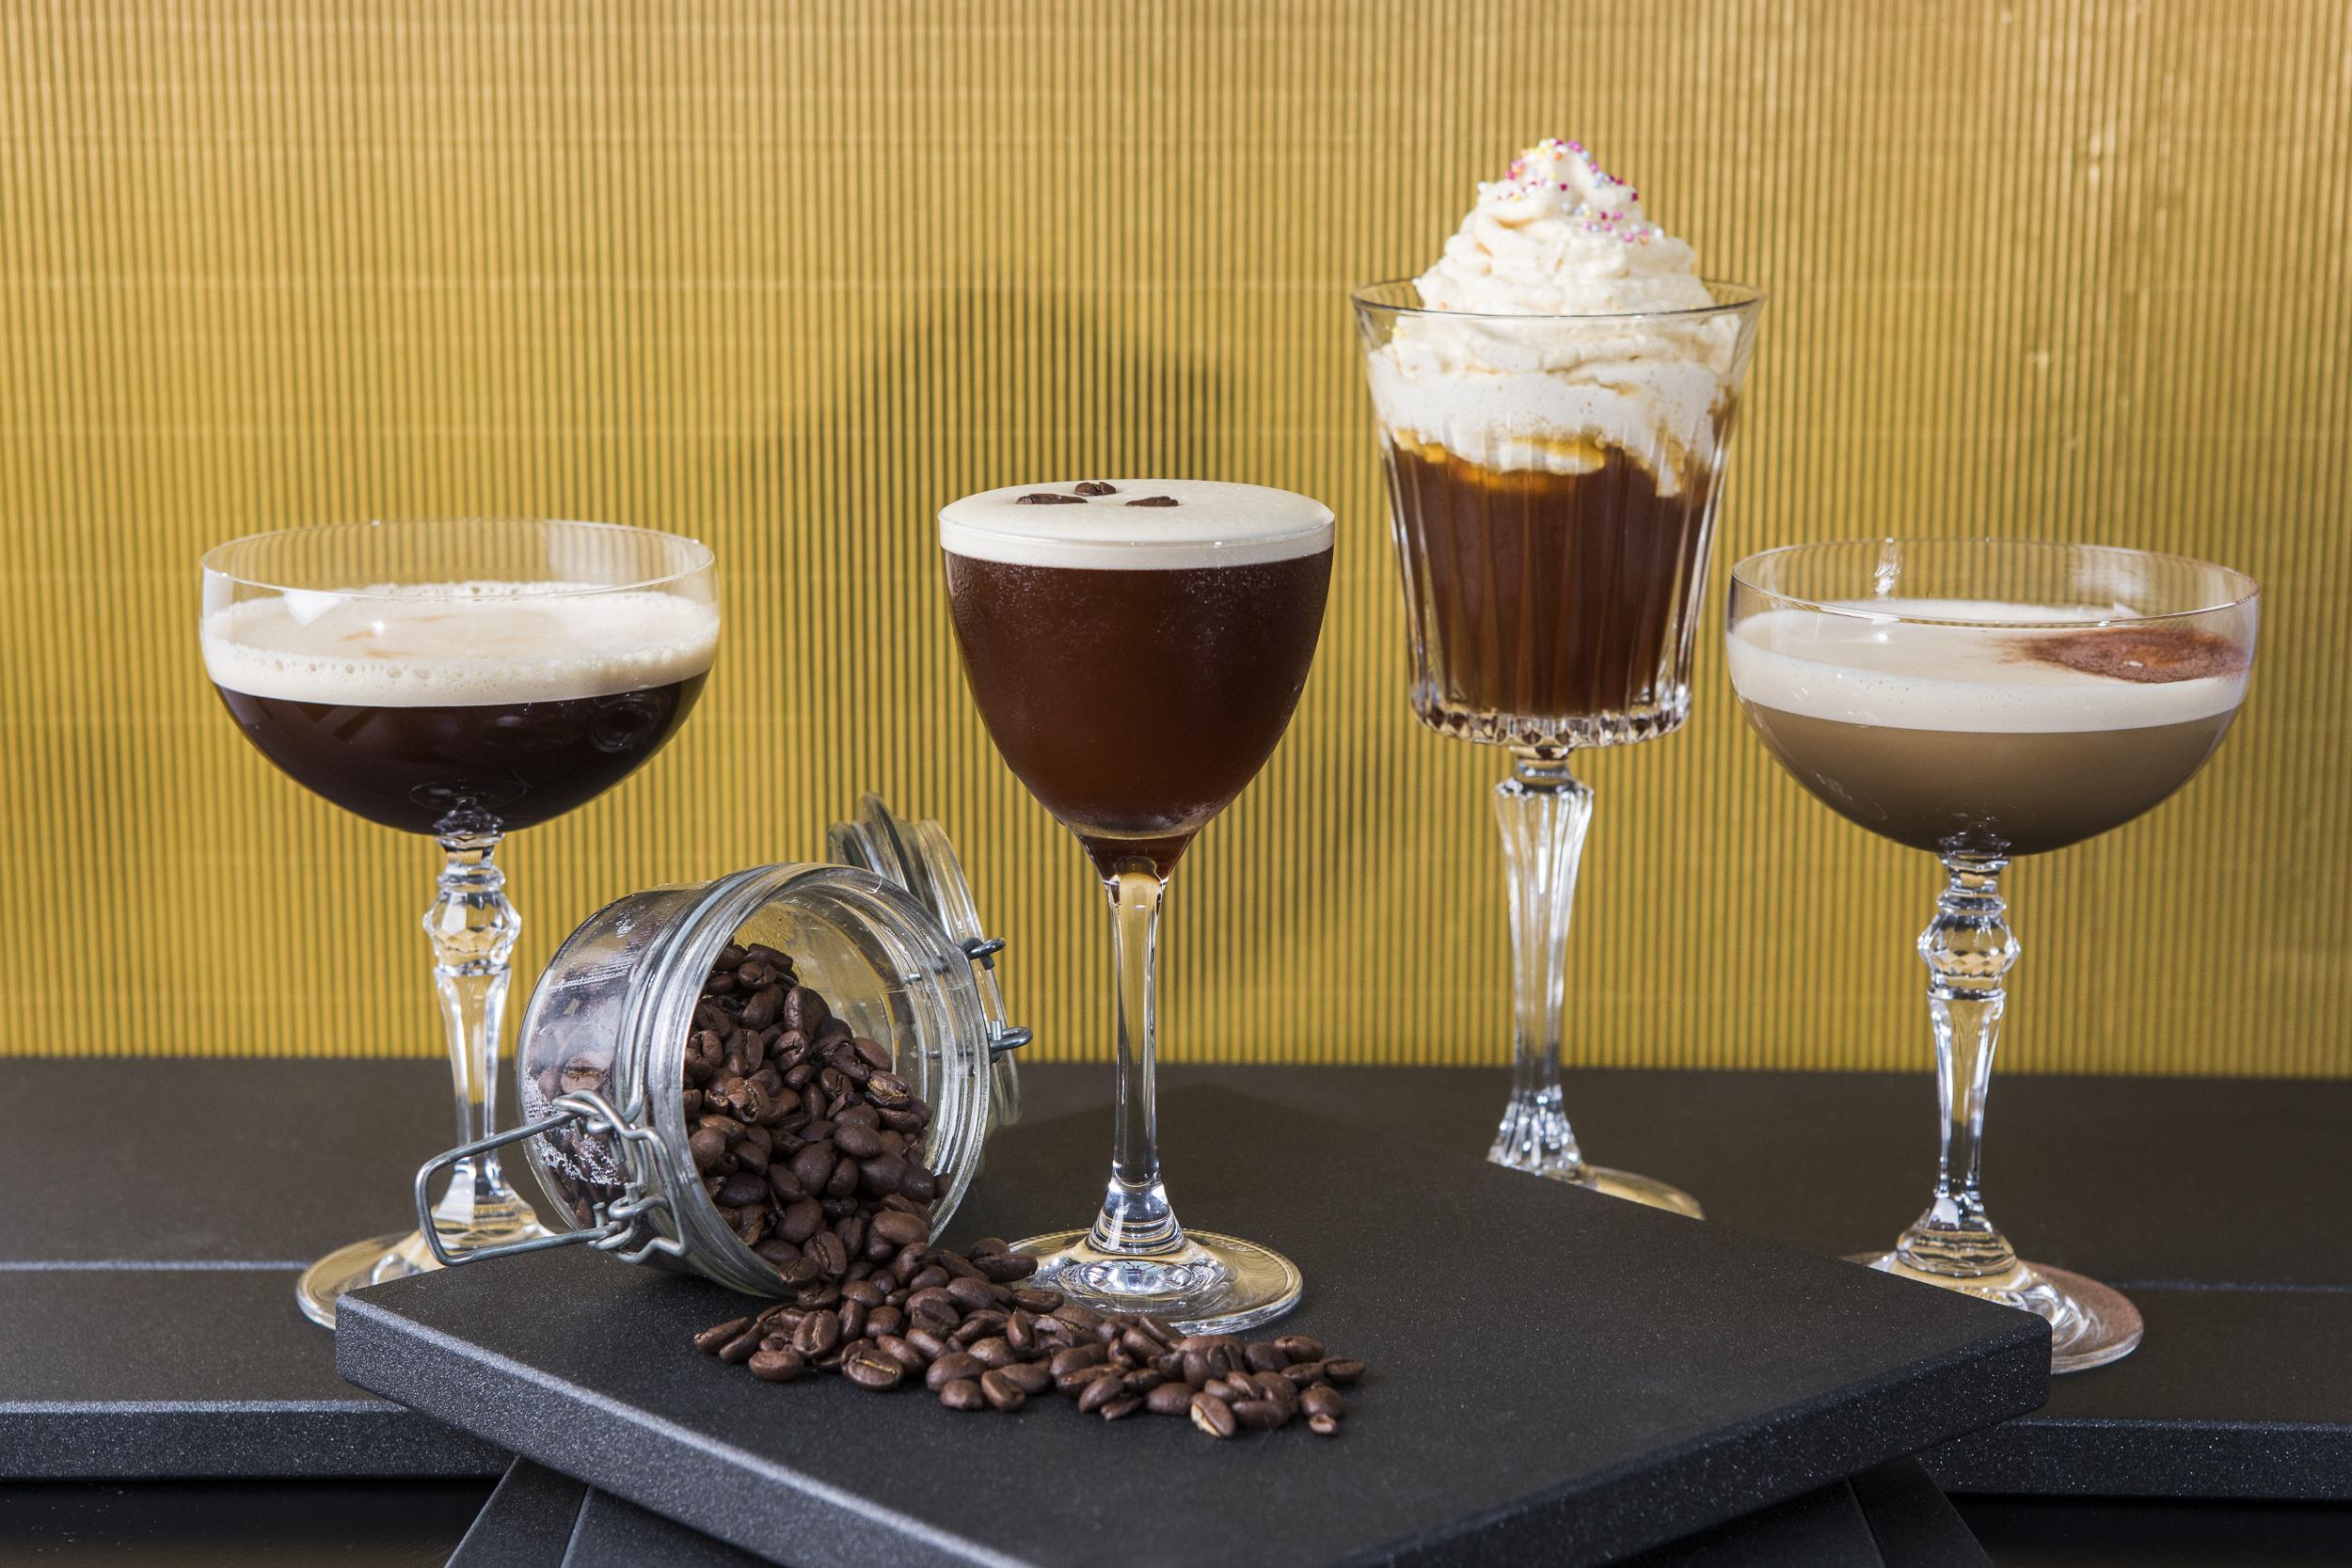 Espresso Martini Cocktail Menu - Searcys at the Gherkin